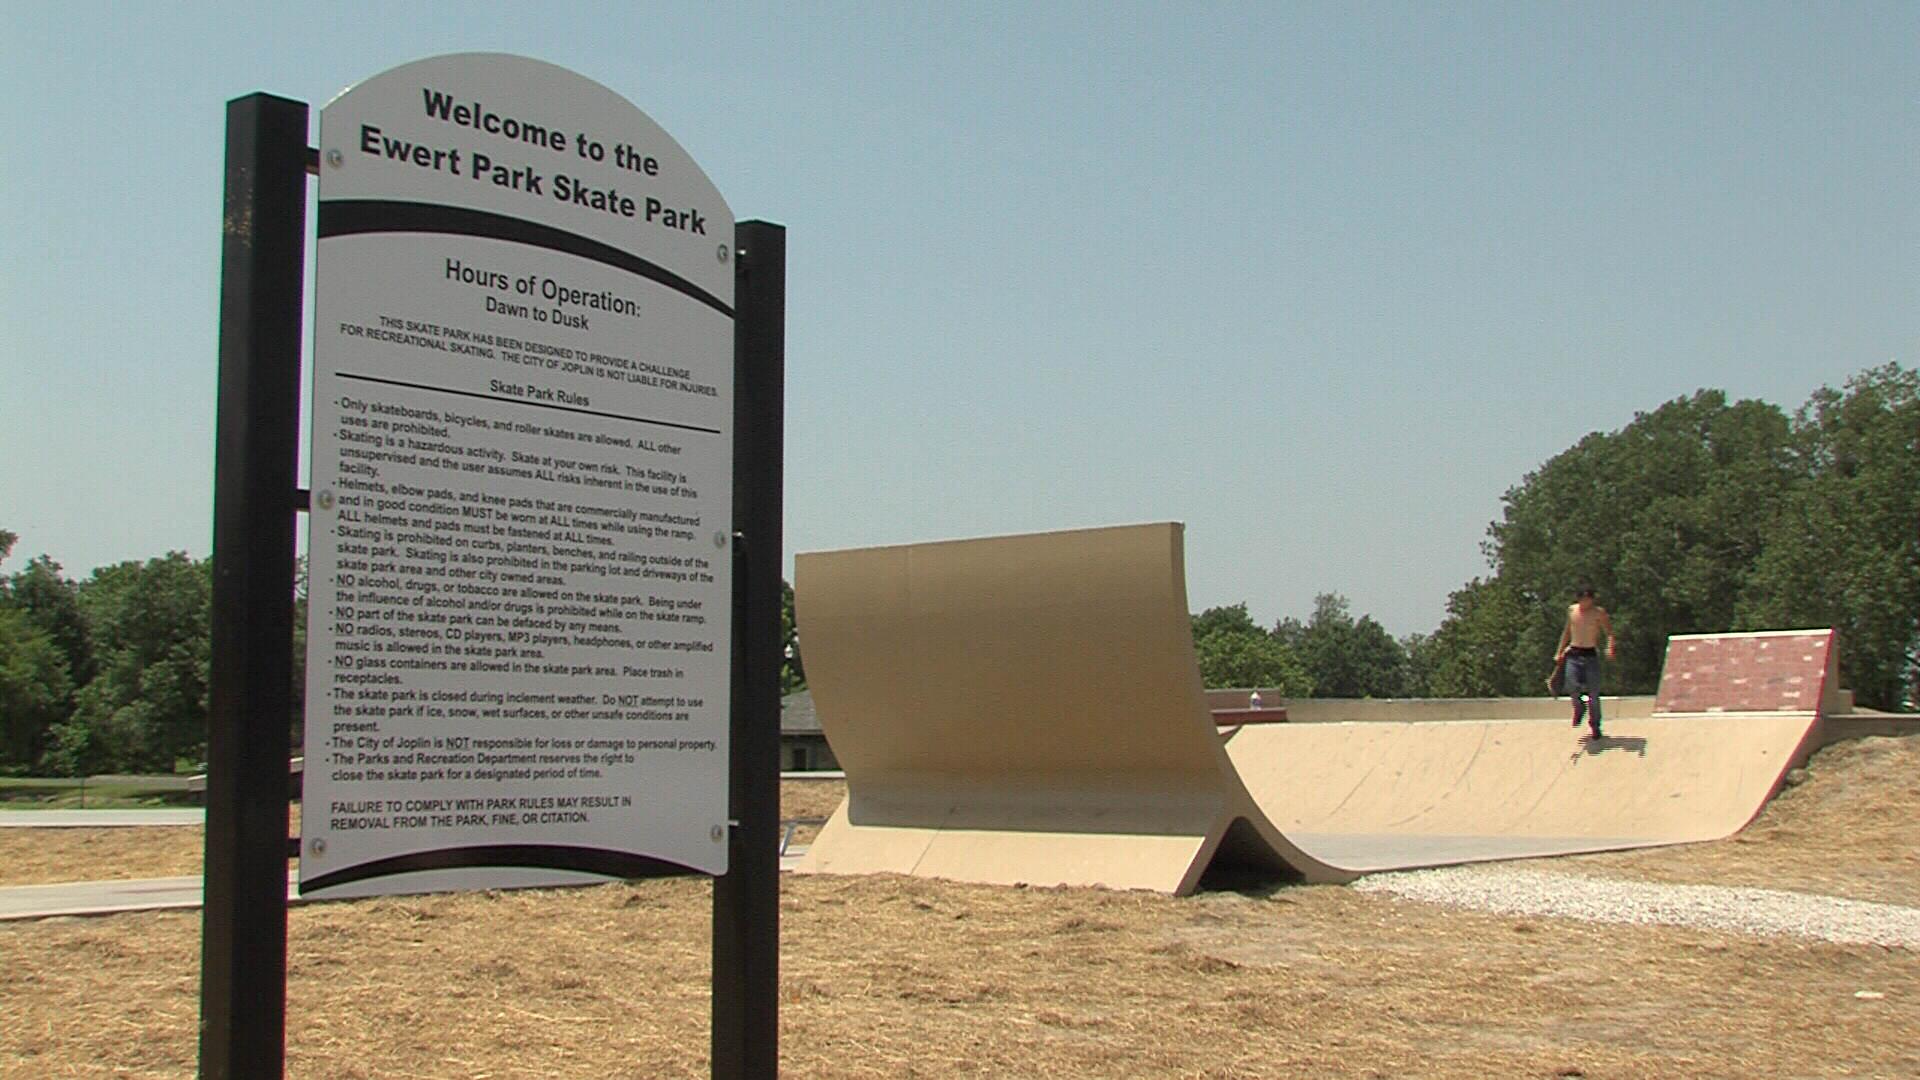 Skate park at Ewert Park